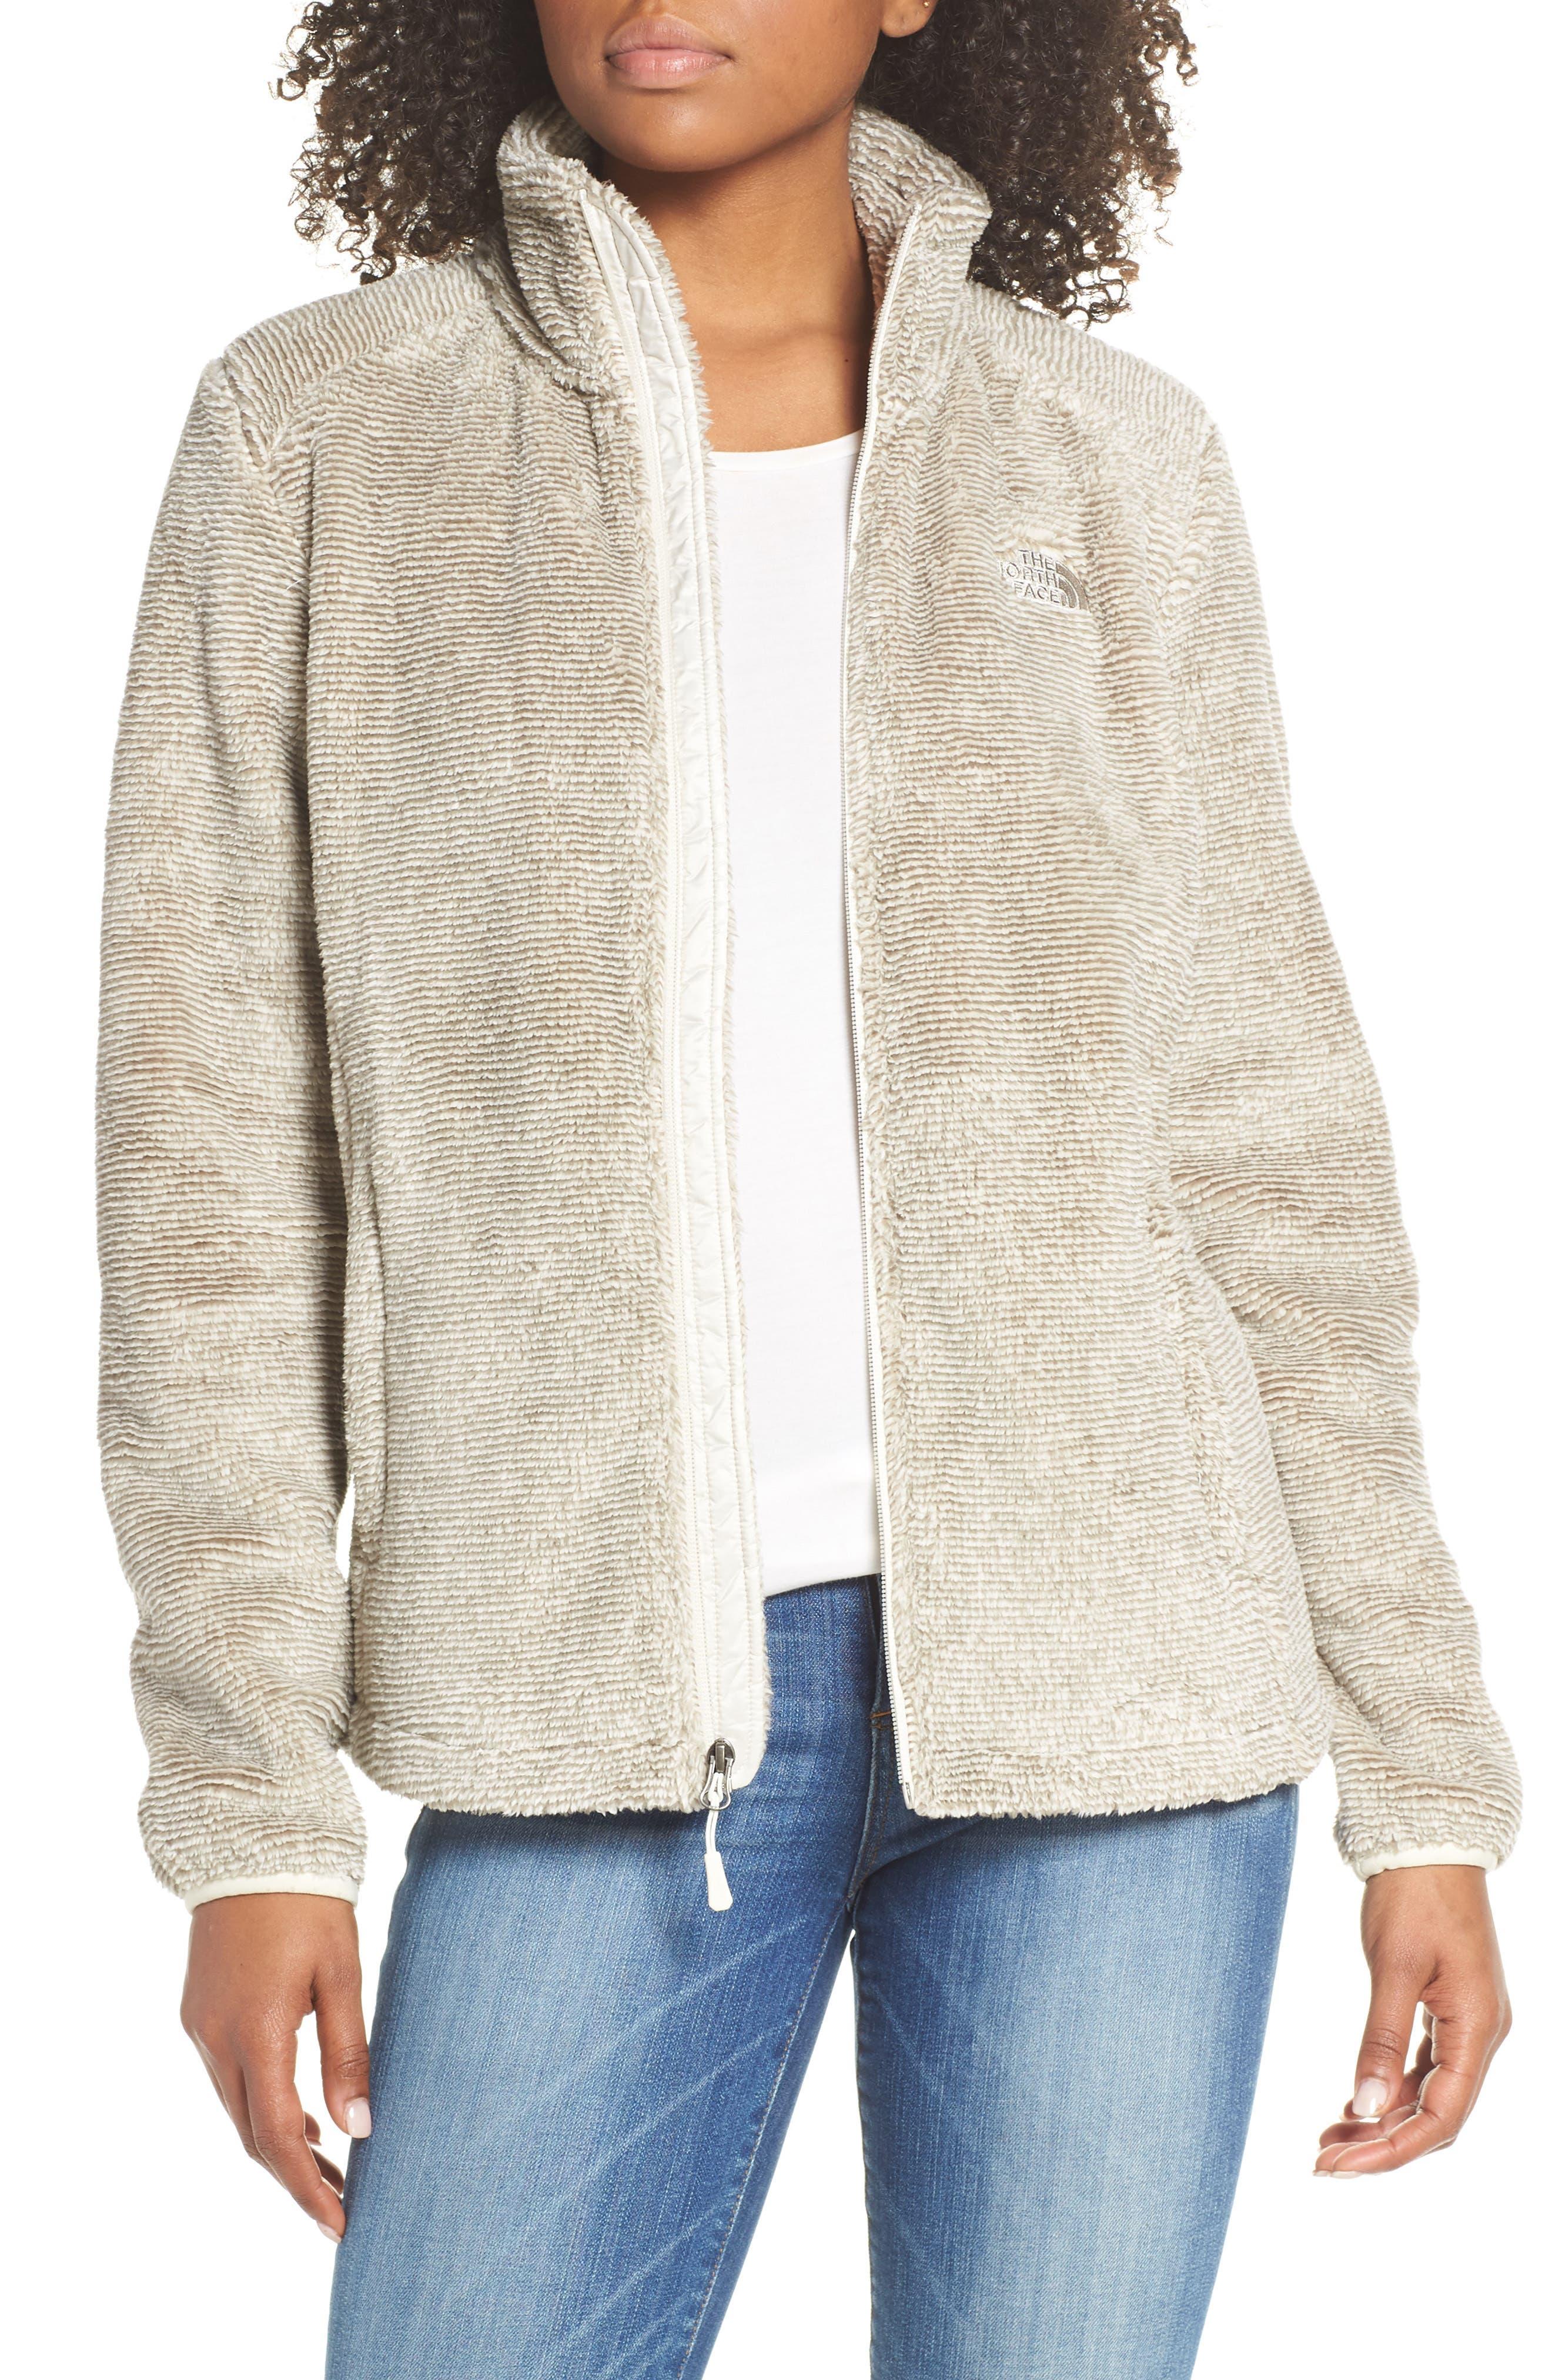 THE NORTH FACE, Osito 2 Stripe Fleece Jacket, Main thumbnail 1, color, GREY/ VINTAGE WHITE STRIPE